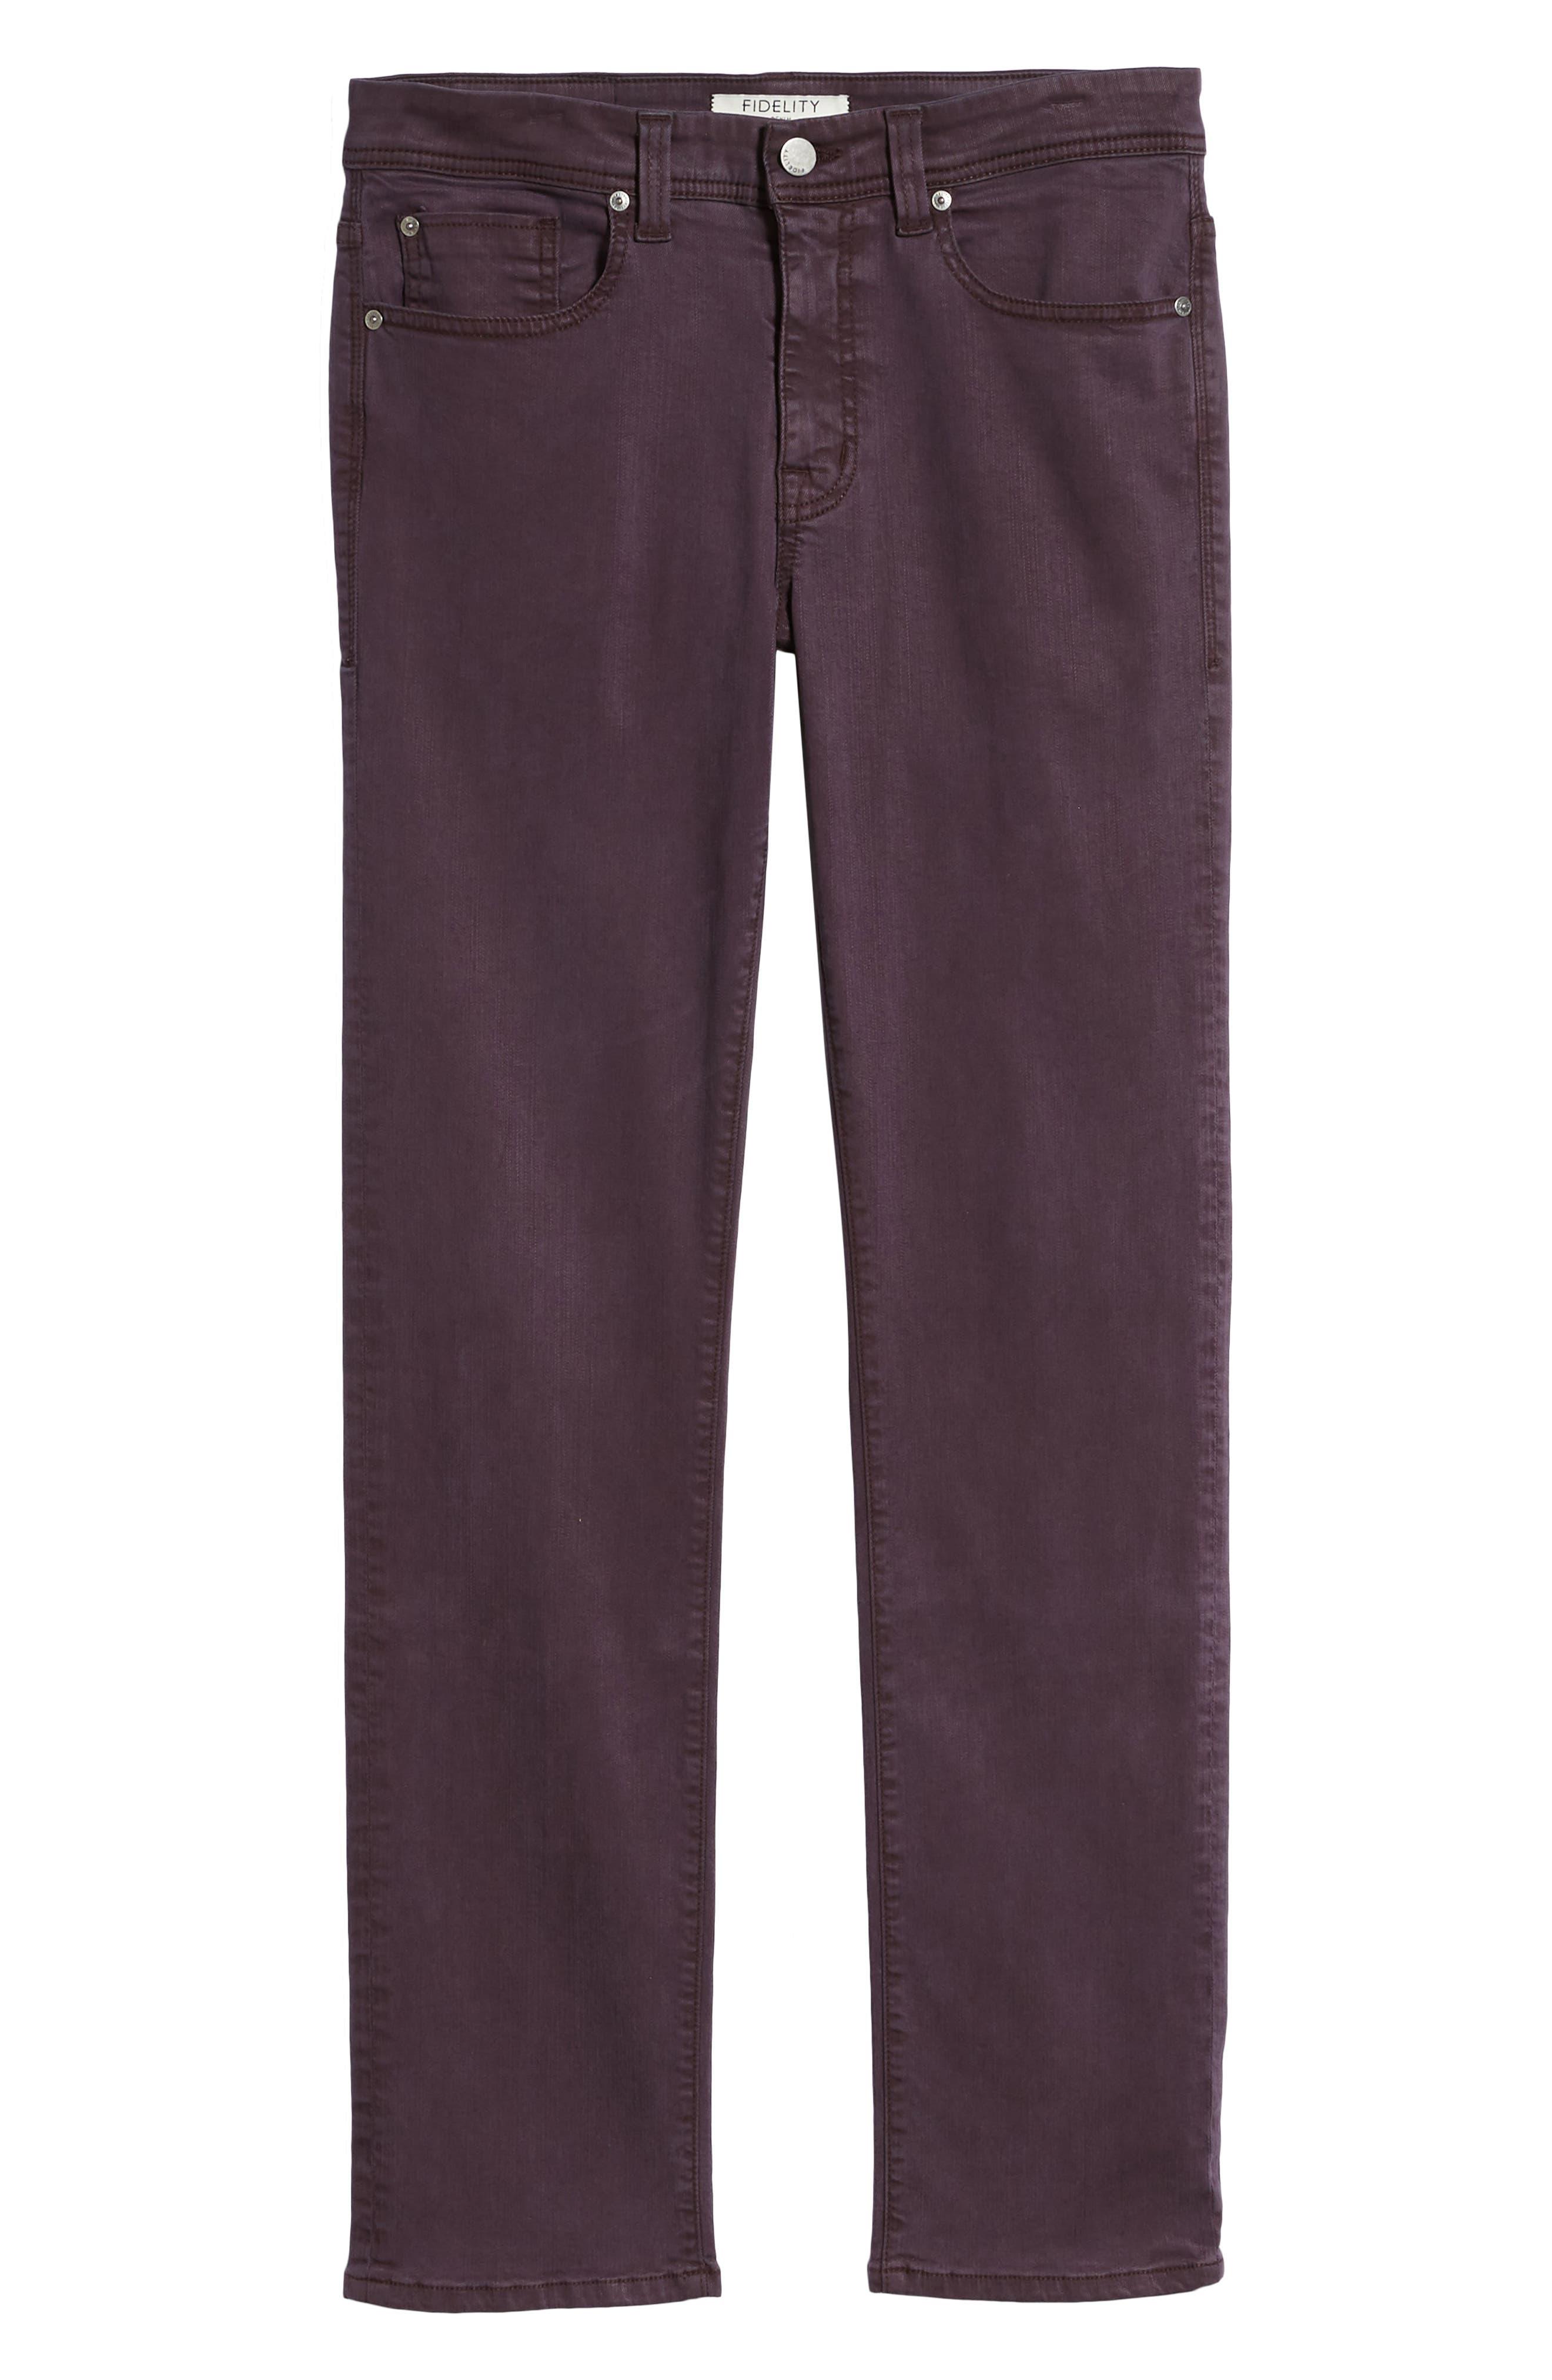 Jimmy Slim Straight Leg Jeans,                             Alternate thumbnail 6, color,                             600